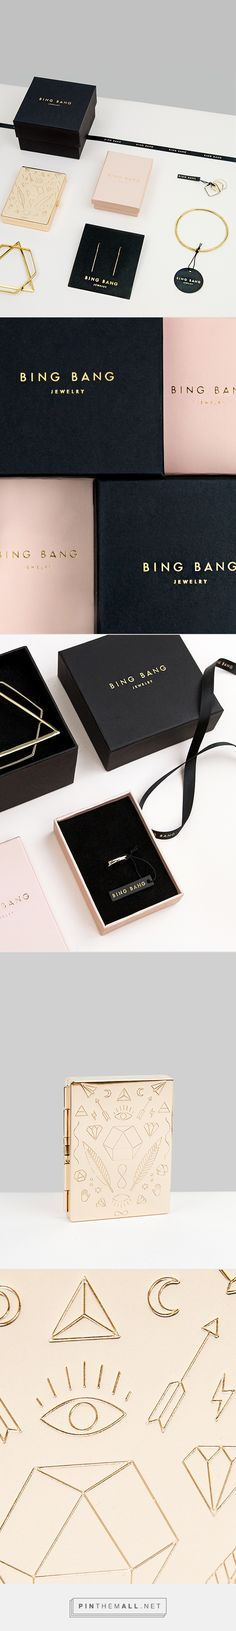 Bing Bang Jewelry Branding & Packaging on Behance